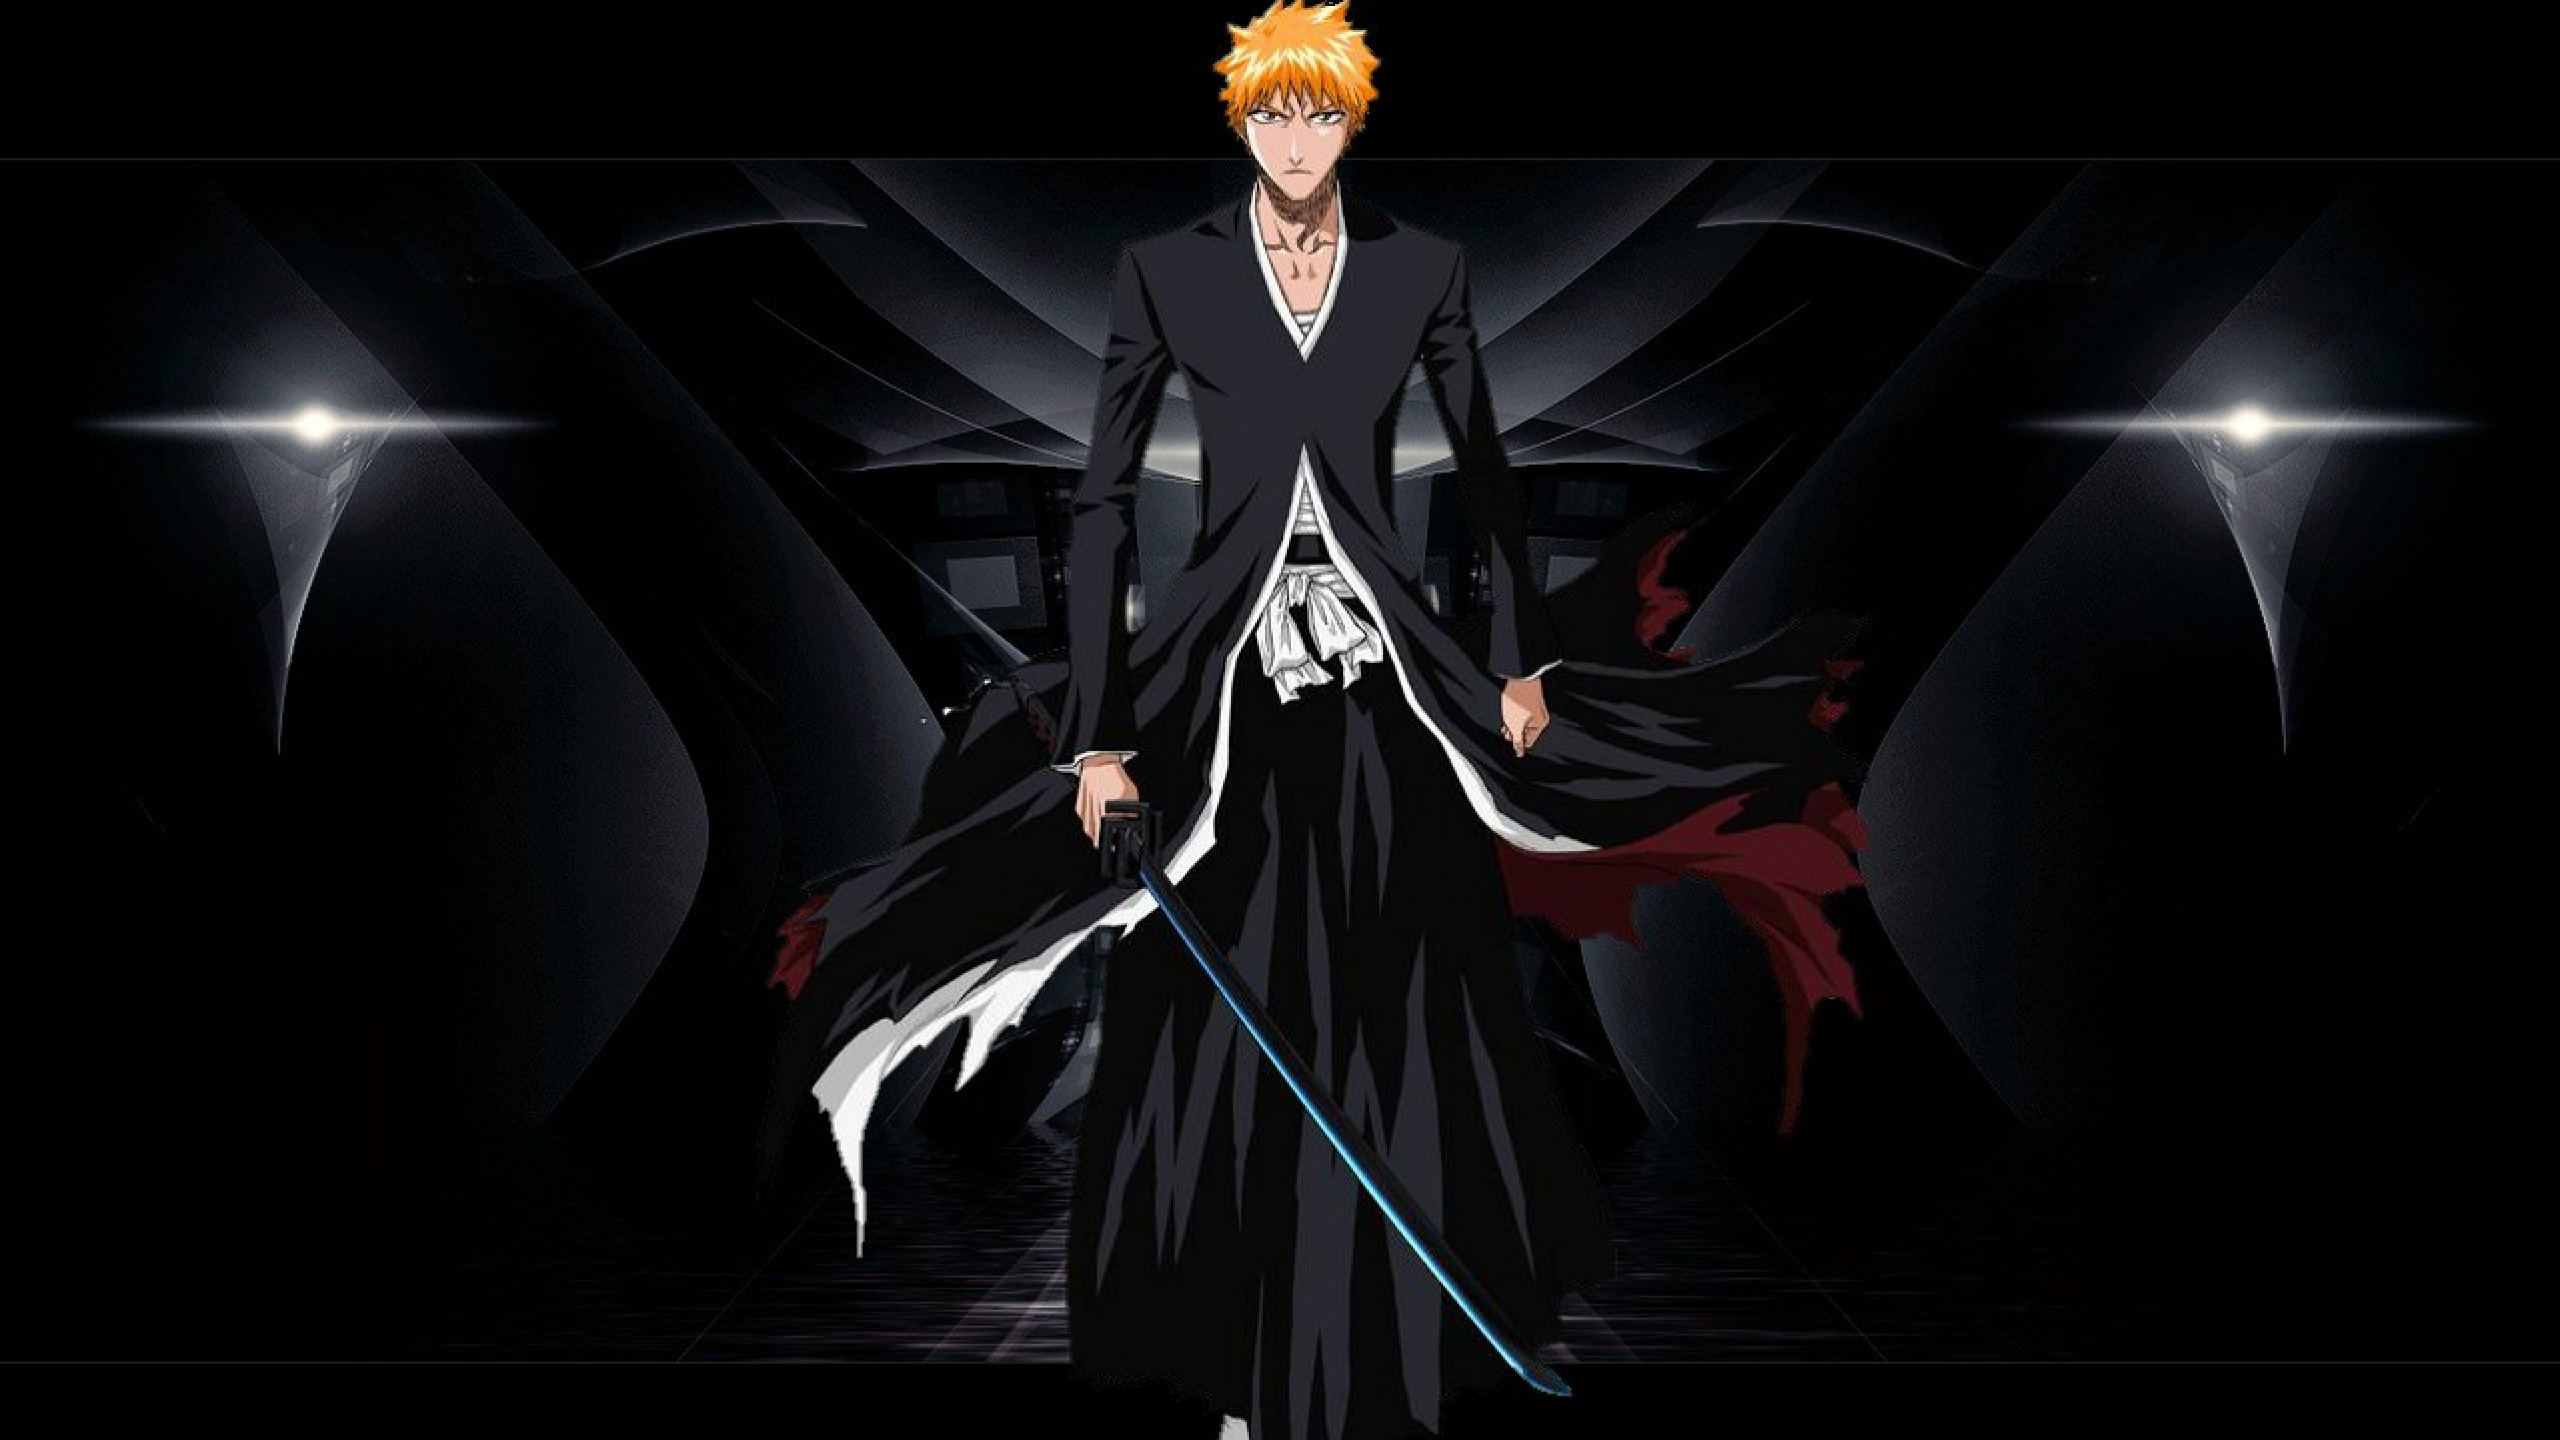 Download Wallpaper 2560x1440 Anime Bleach Character Ichigo Bankai 2560x1440